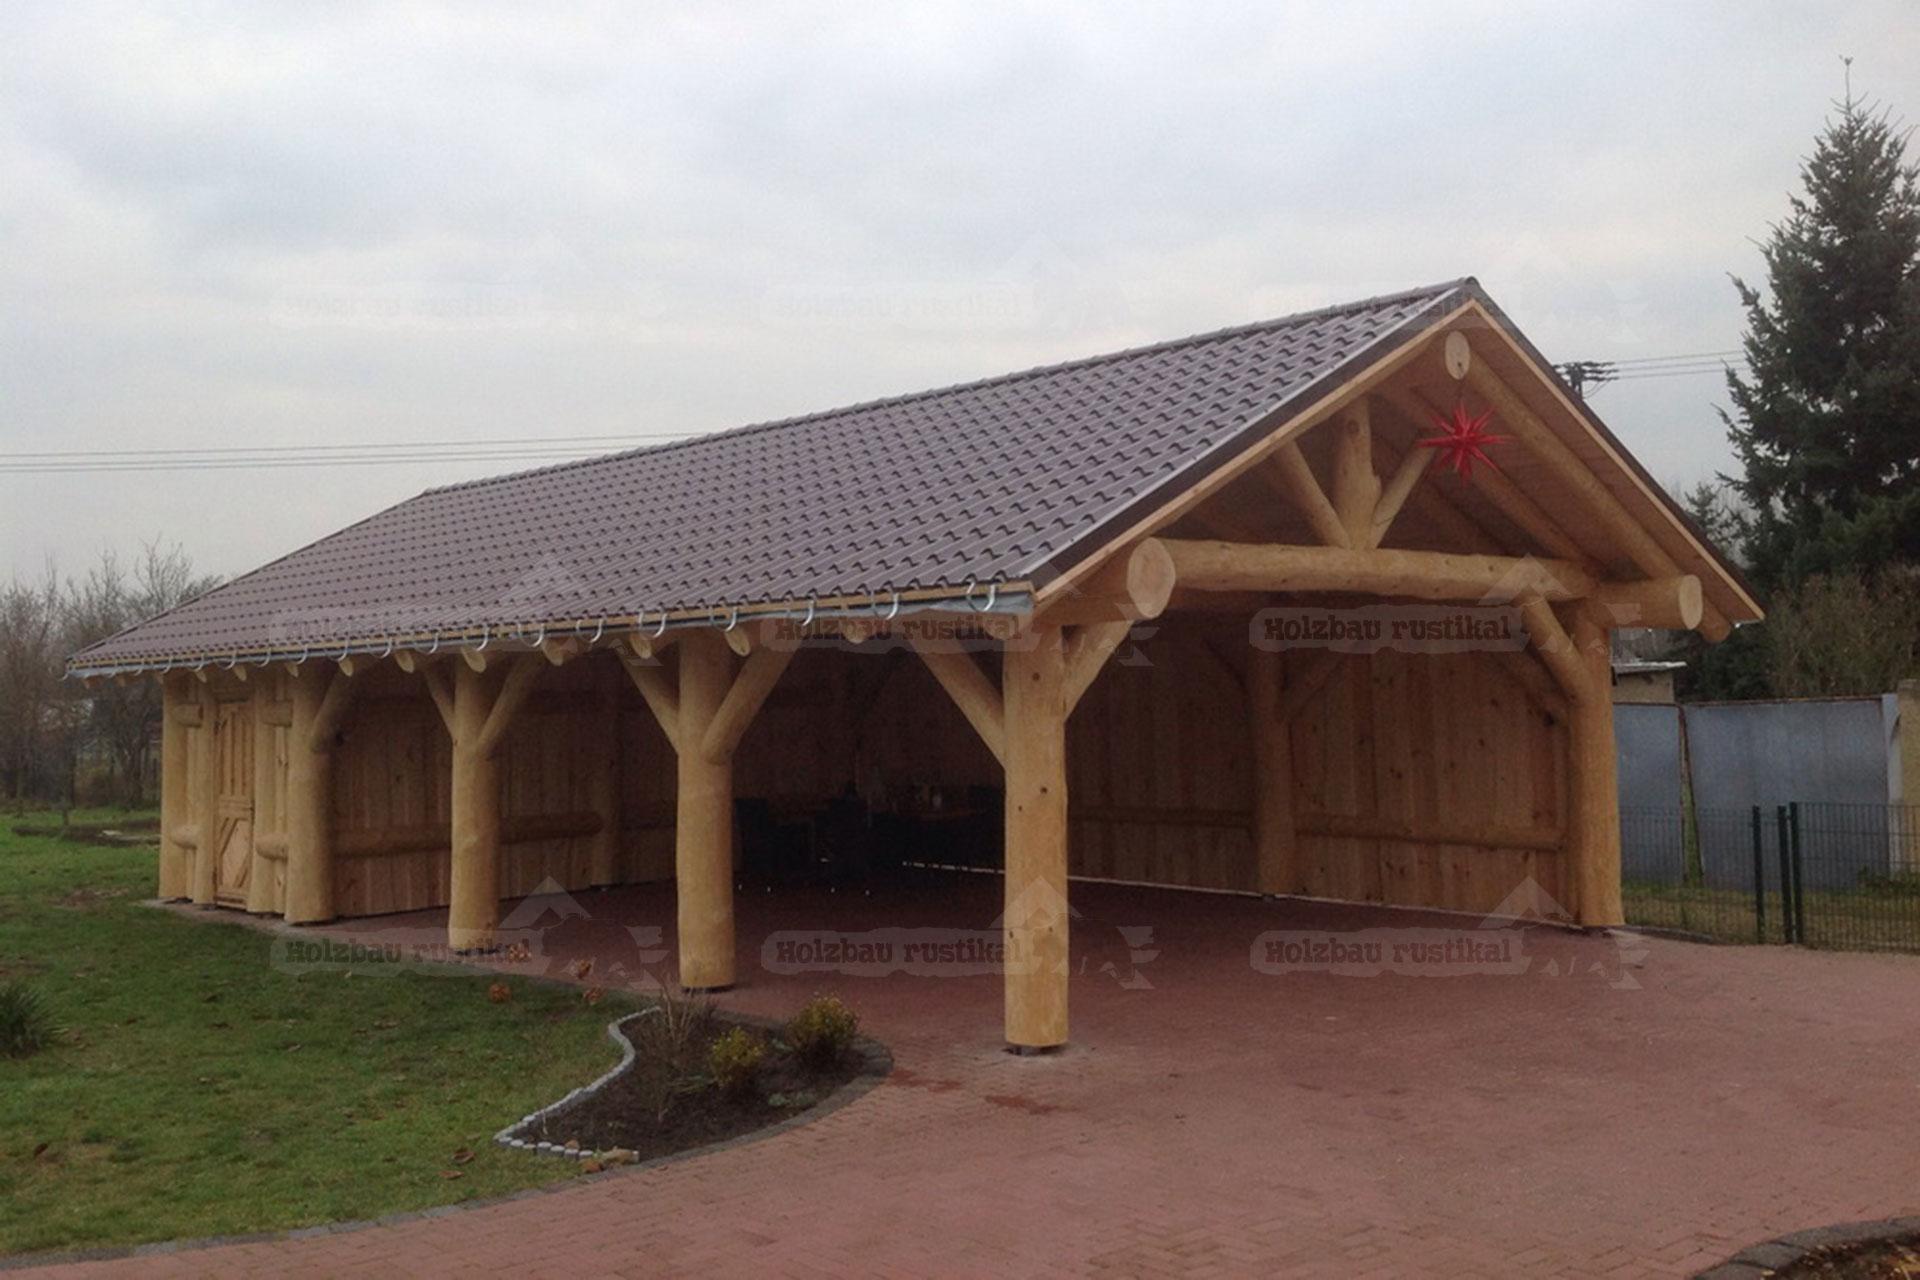 Naturstamm Carport fertig gebaut mit Begrünung